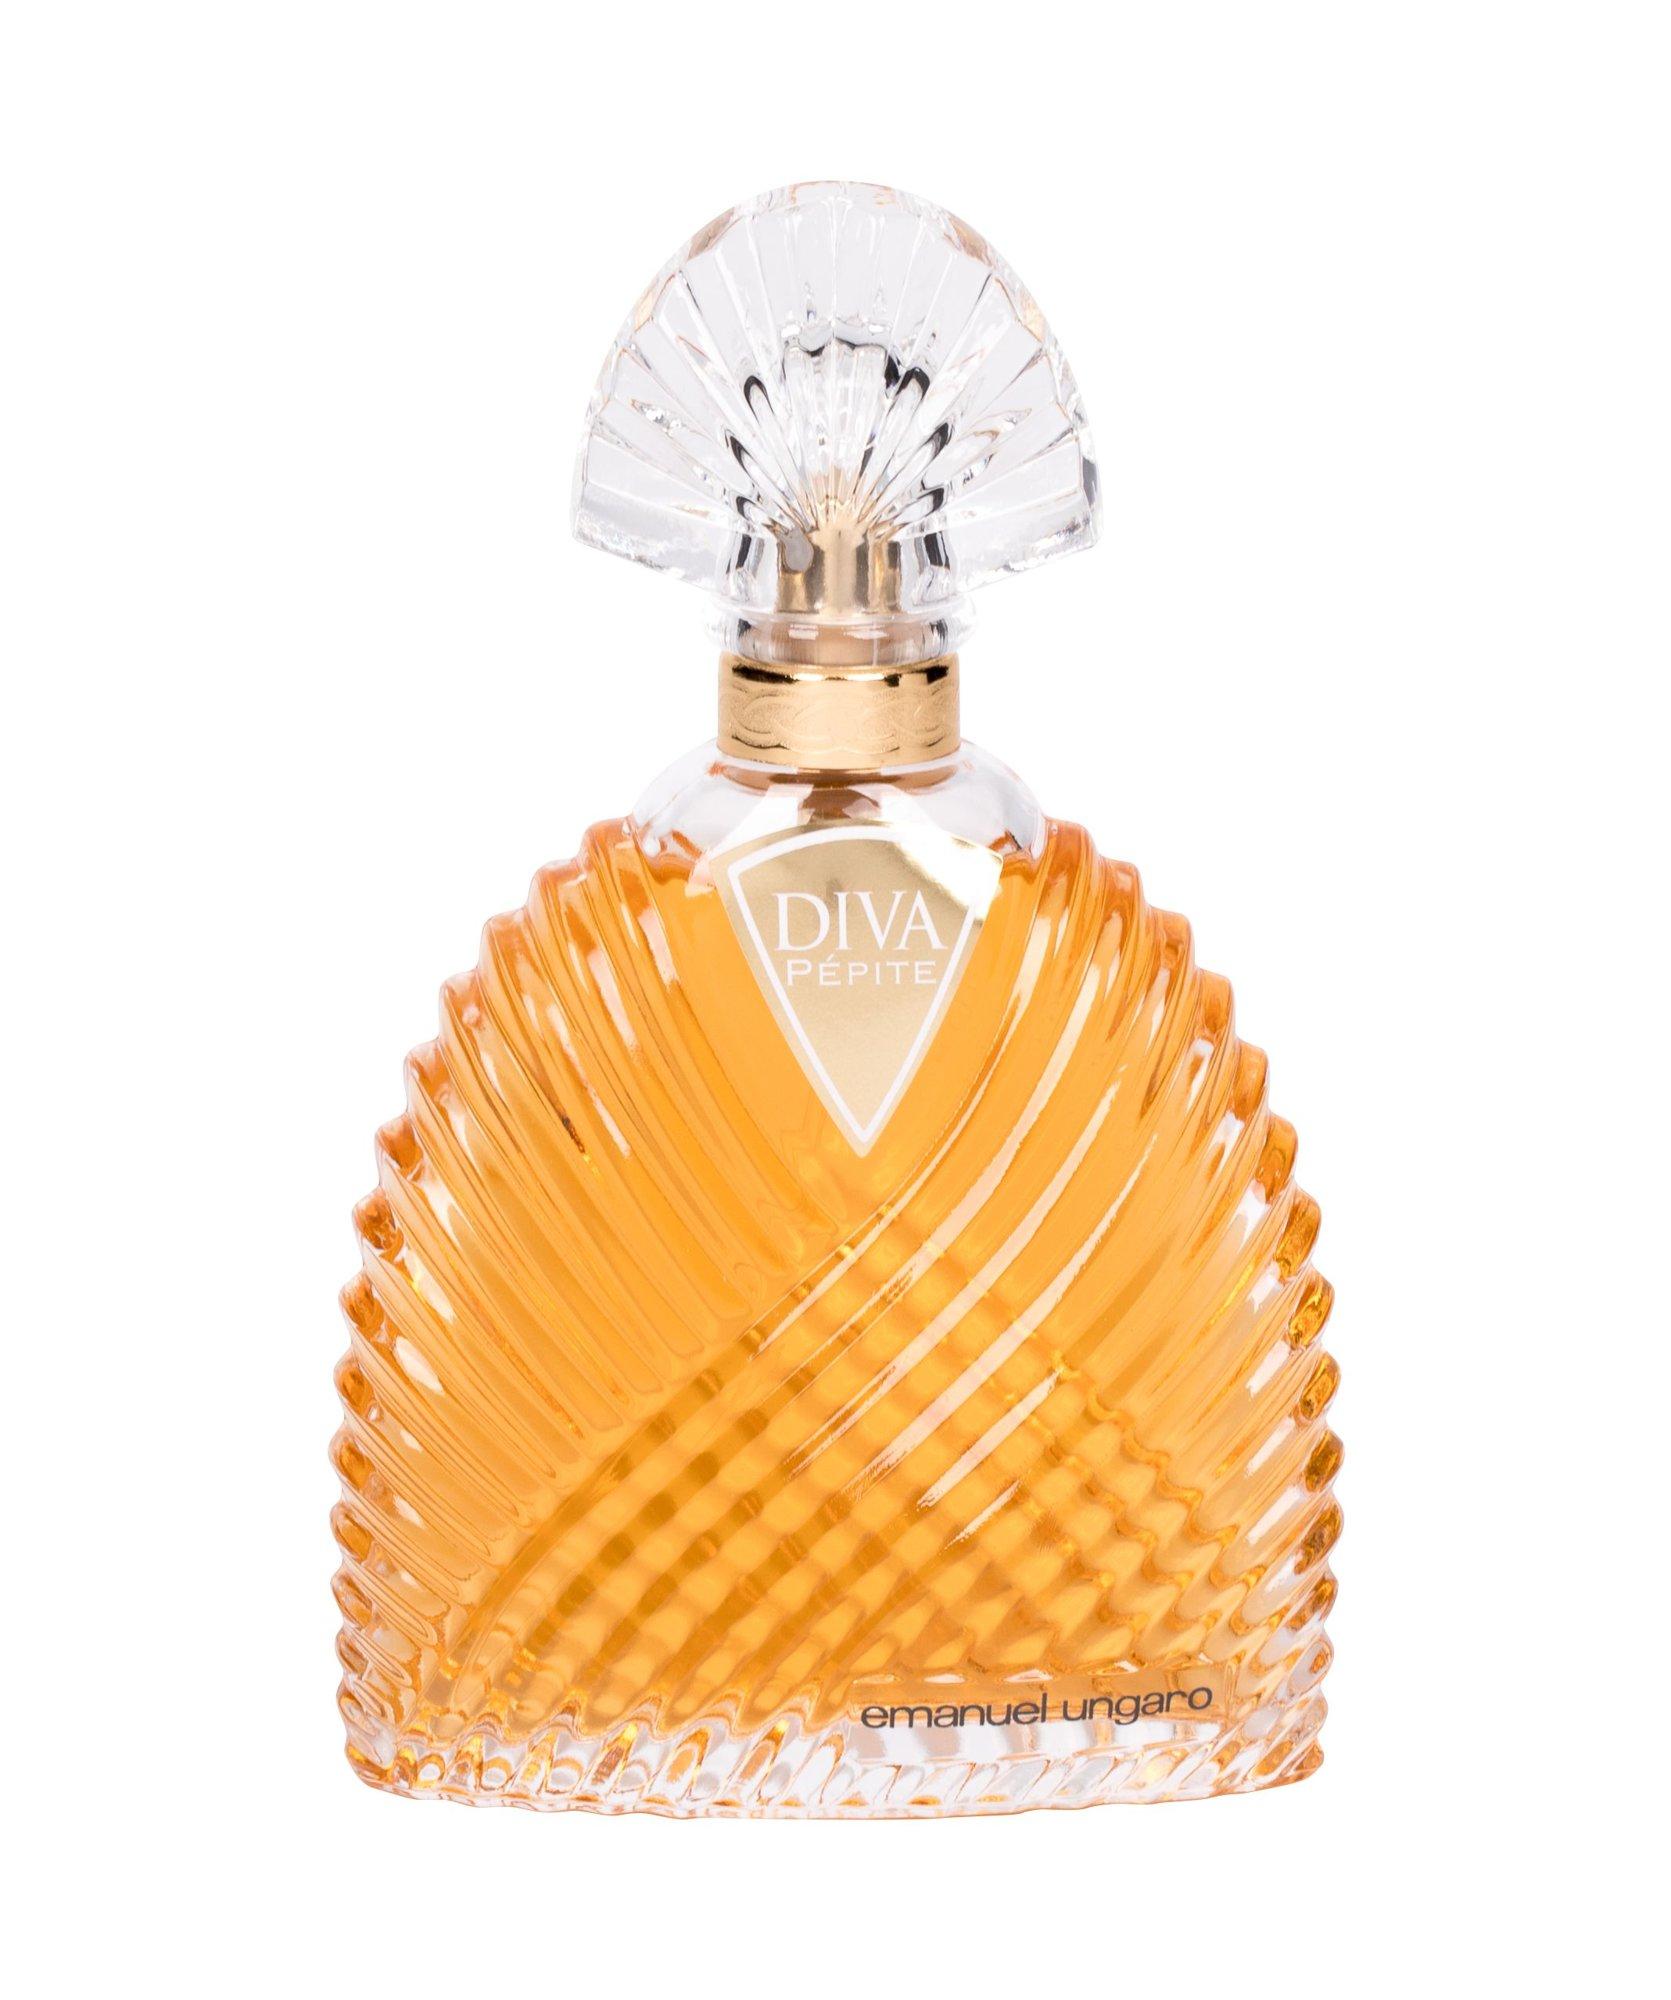 Emanuel Ungaro Diva Pepite, Parfumovaná voda 100ml